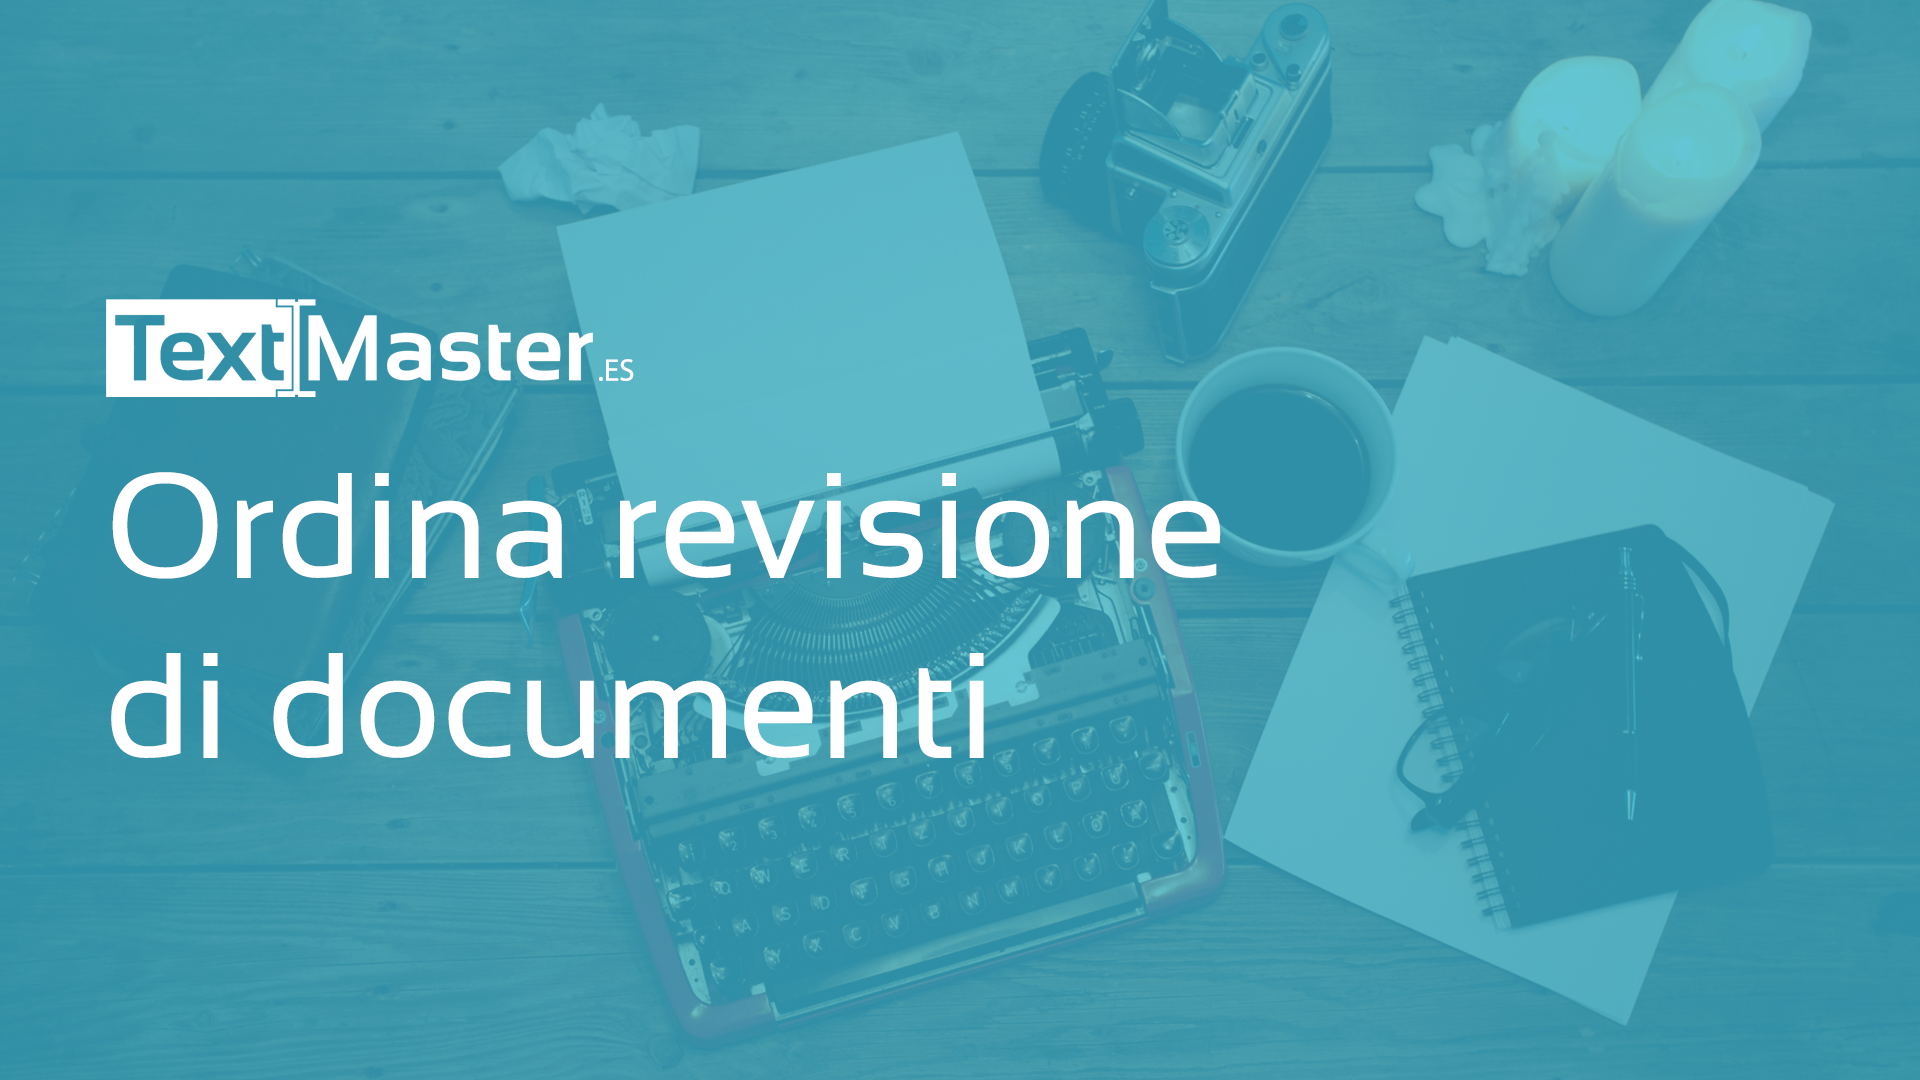 Ordina revisione di documenti